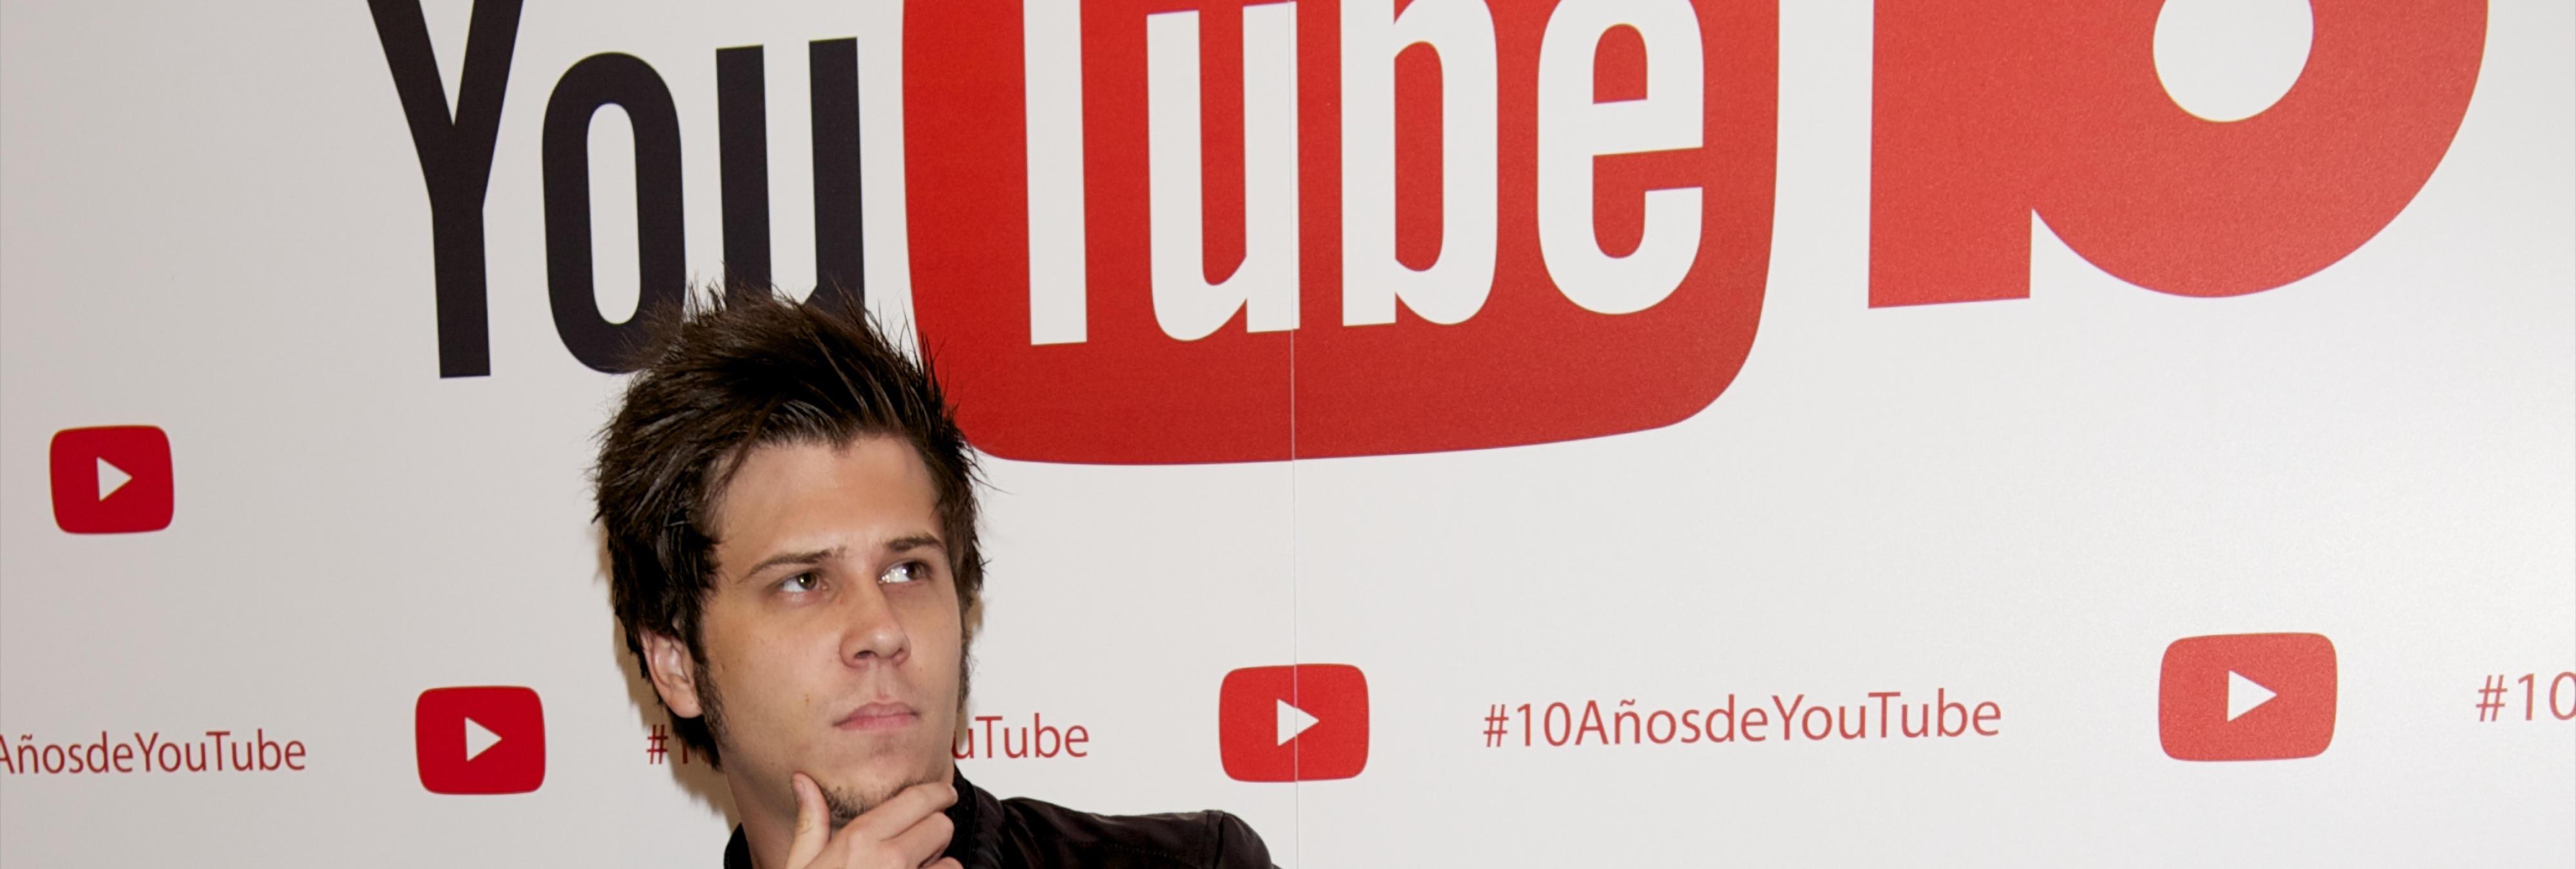 Reunión masiva de youtubers en el 'YouTube Rewind 2015'